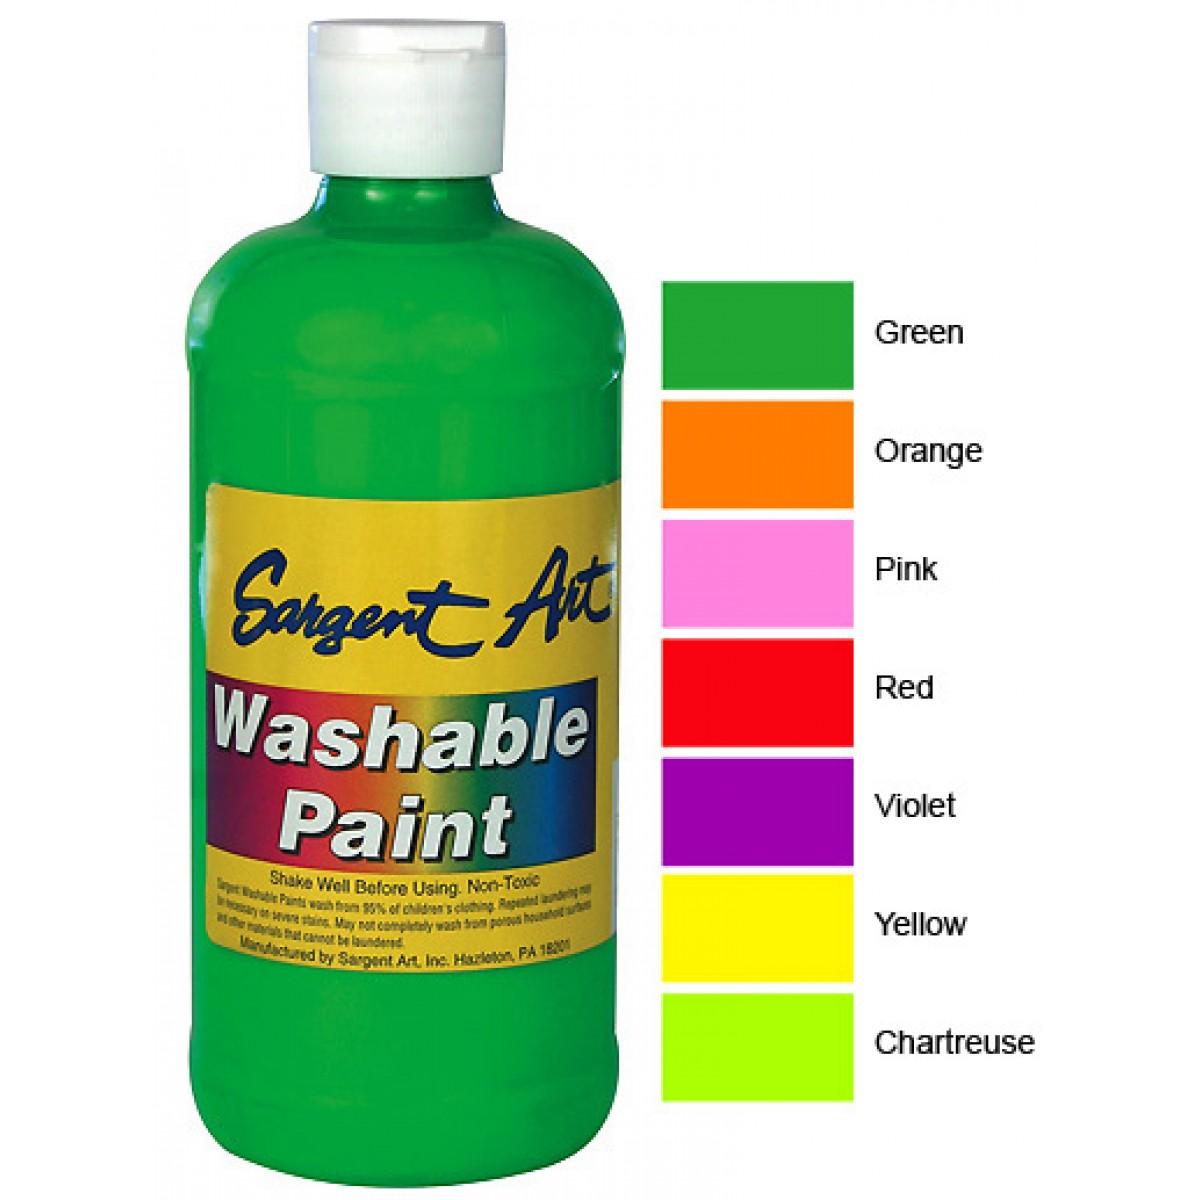 sargent washable fluorescent paint choice of 7 colors washable